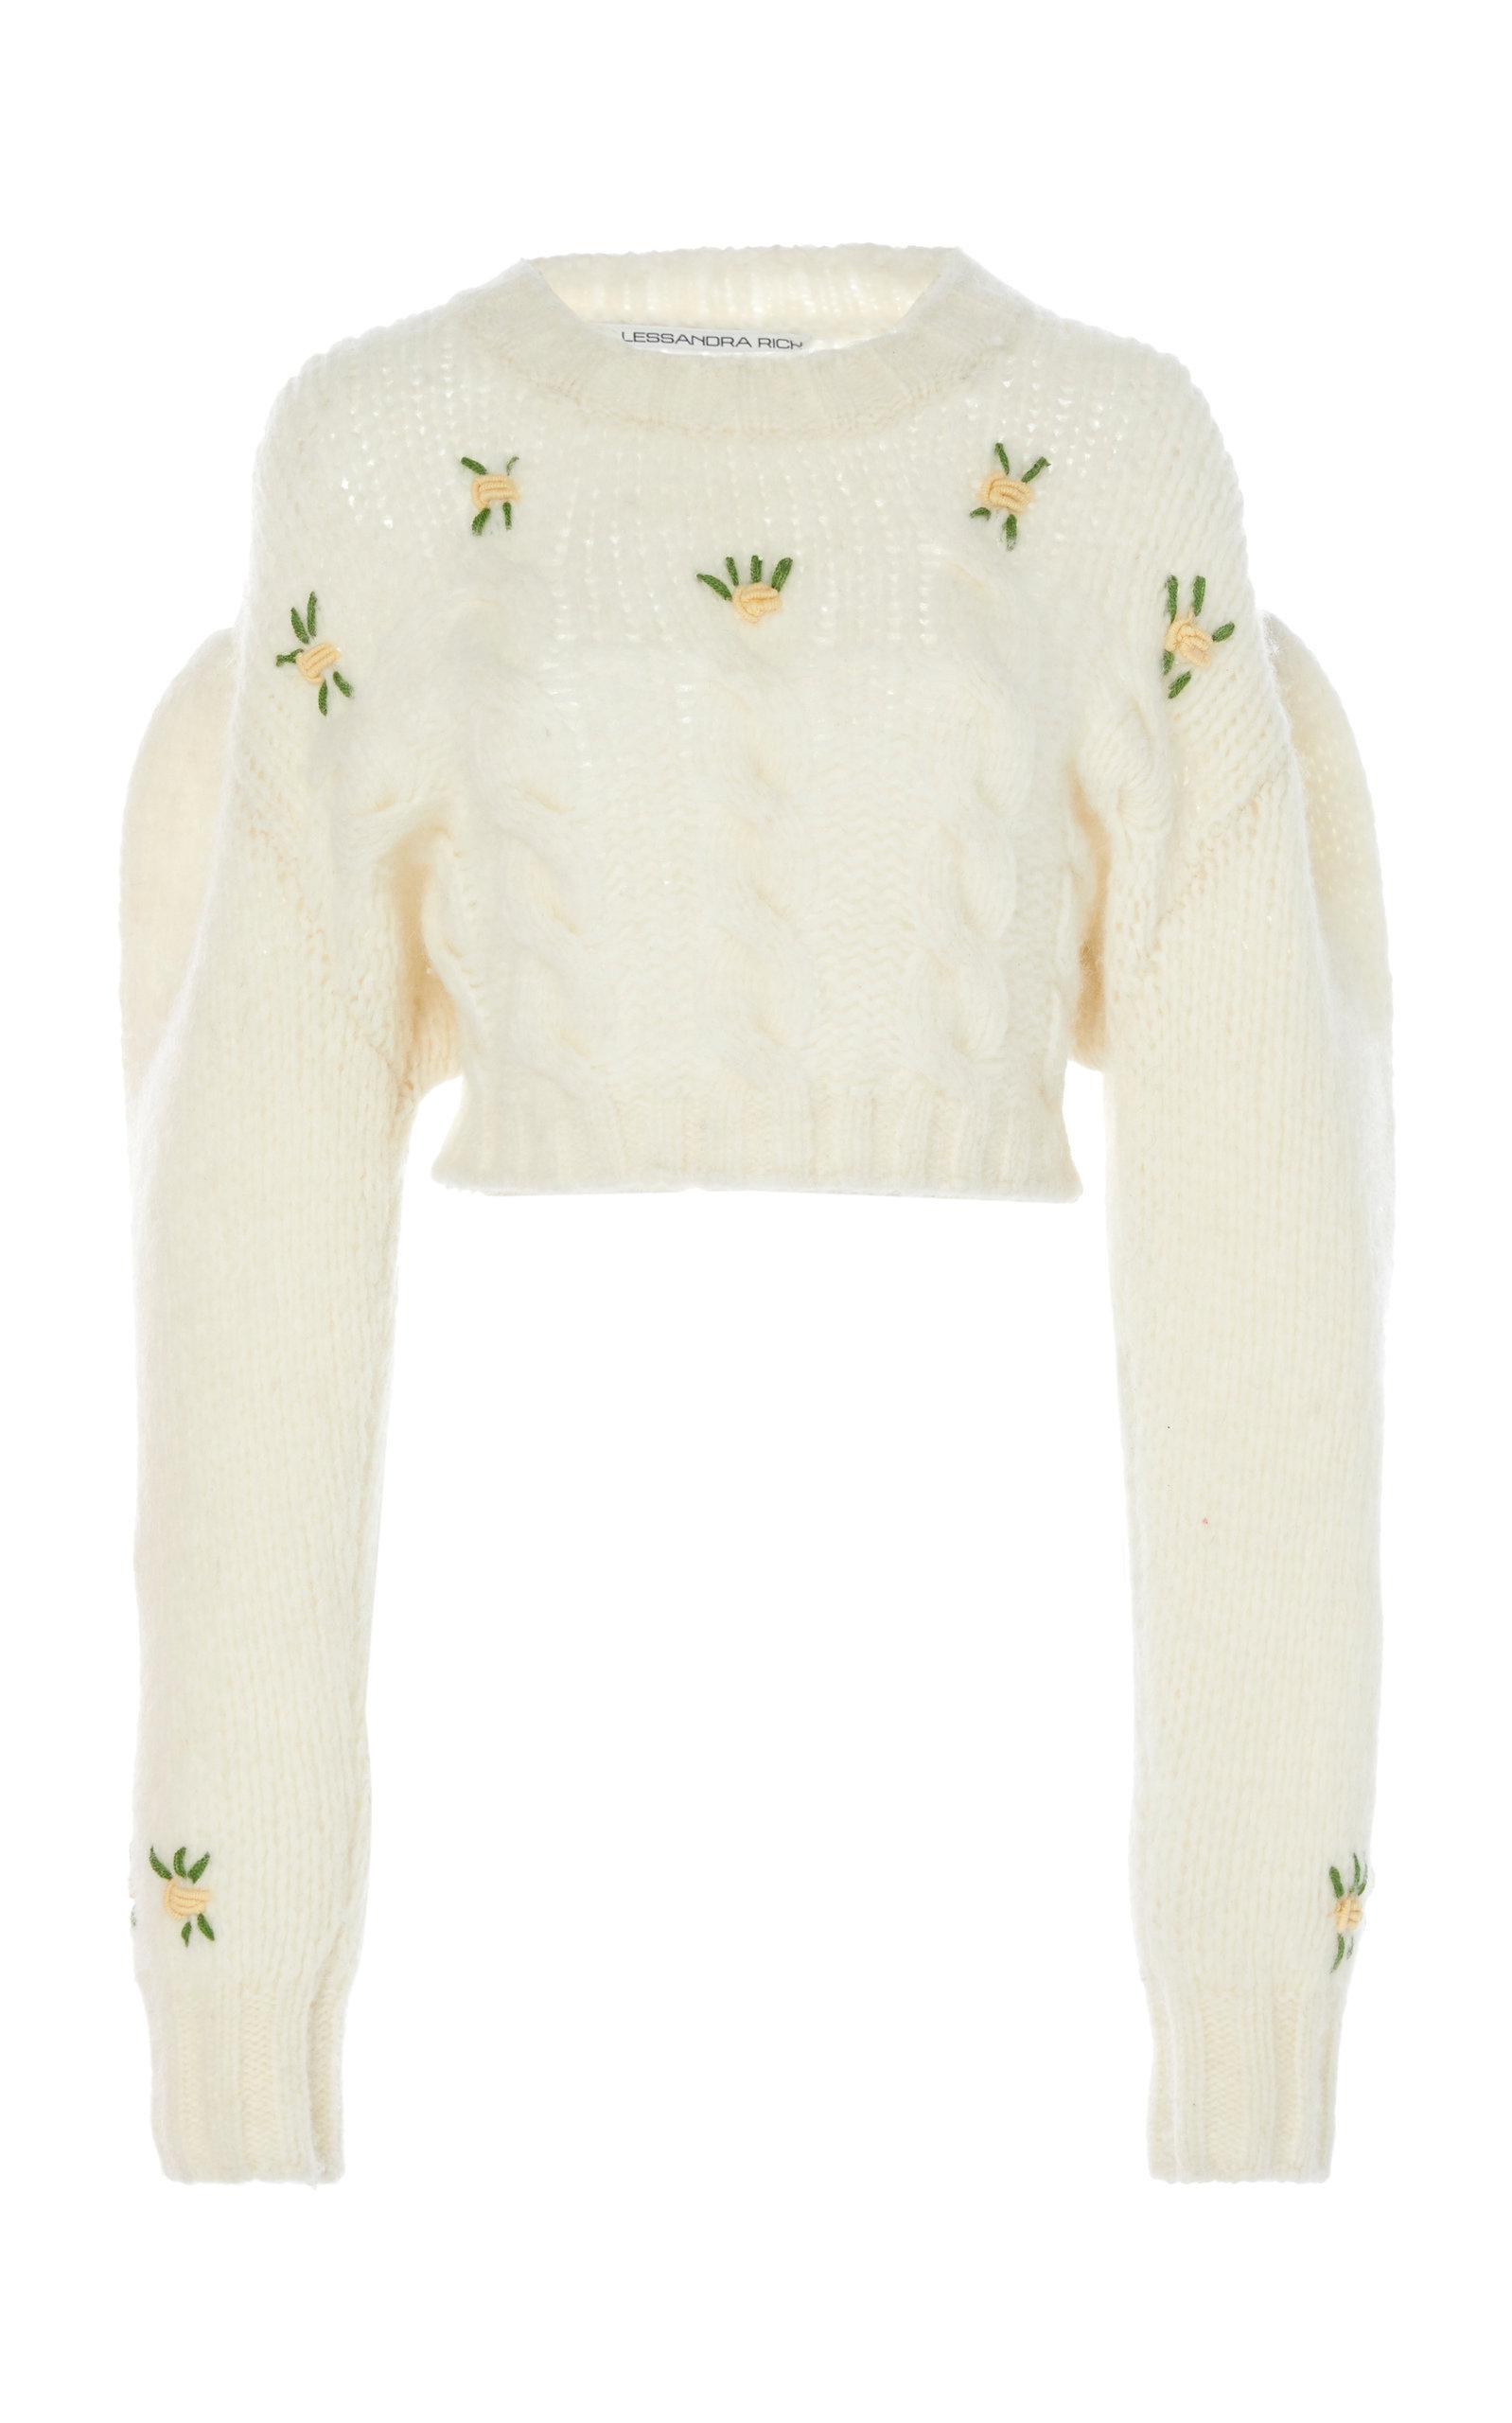 Alessandra Rich Sweater, $740